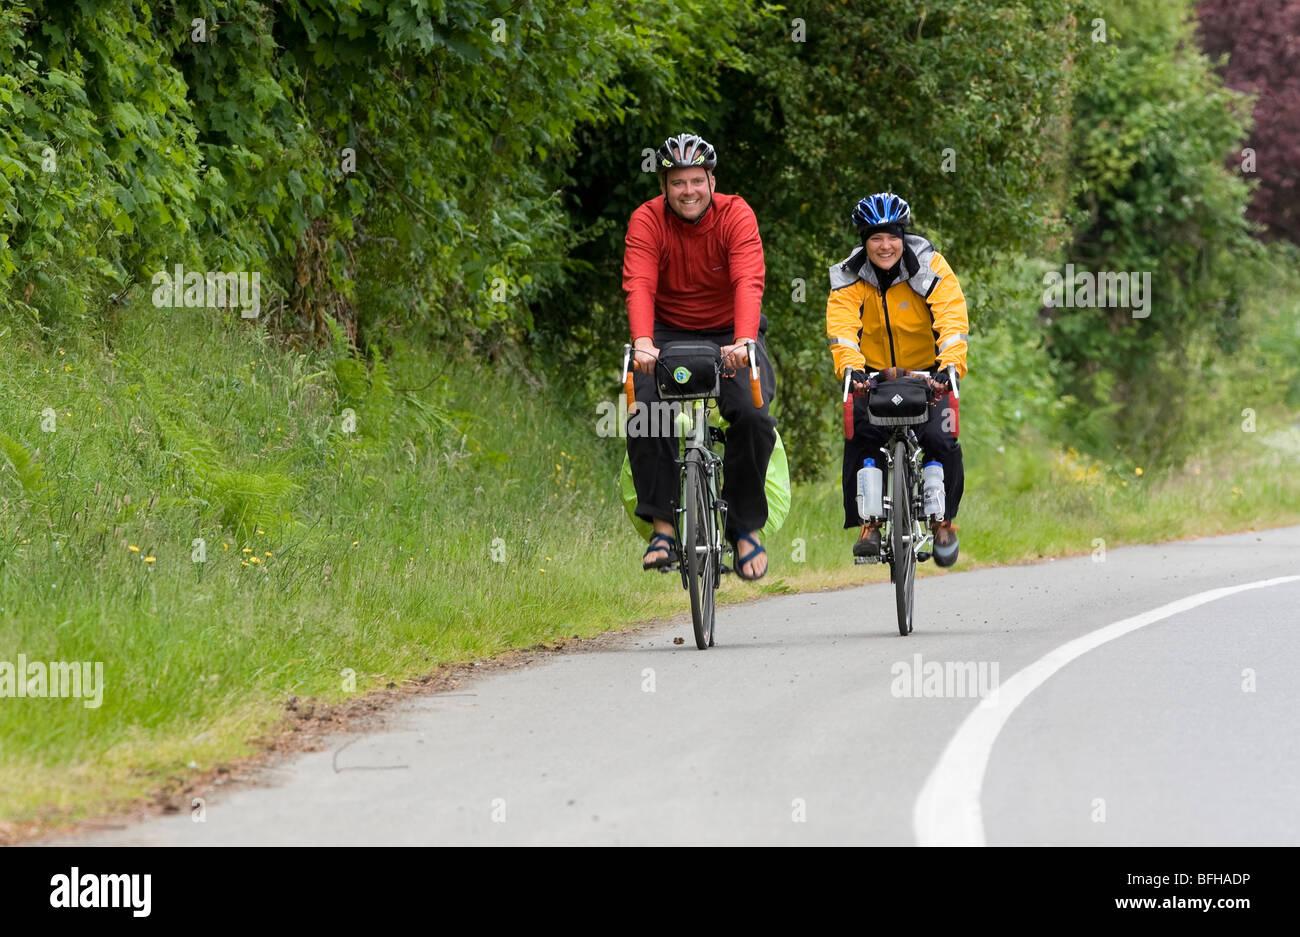 Bike touring at Qualicum Beach,Vancouver Island, British Columbia, Canada. - Stock Image